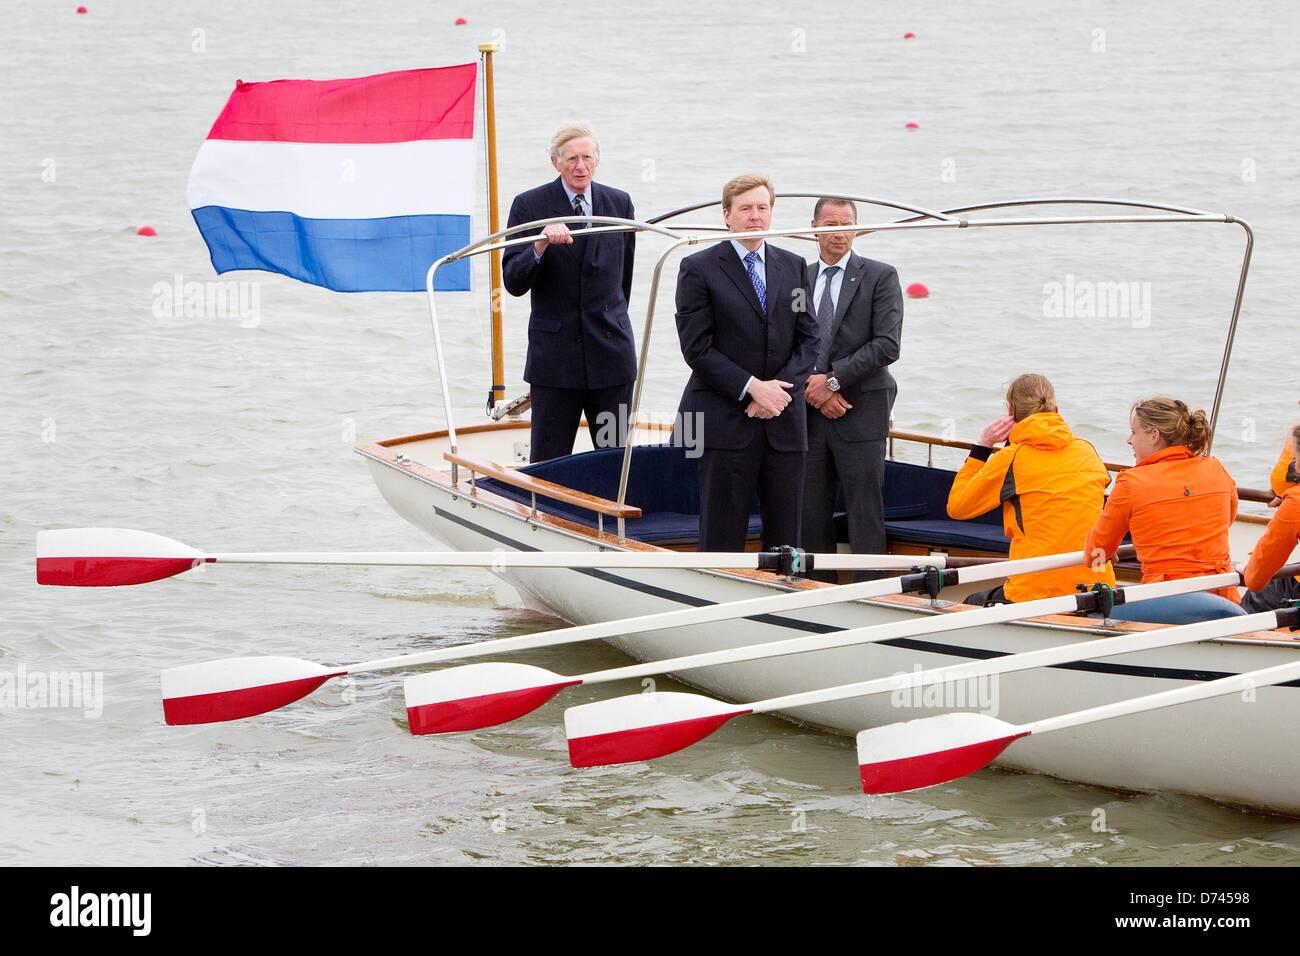 Crown Prince Willem-Alexander of The Netherlands opens the rowing course Willem-Alexander Course at the Eendragtspolder - Stock Image